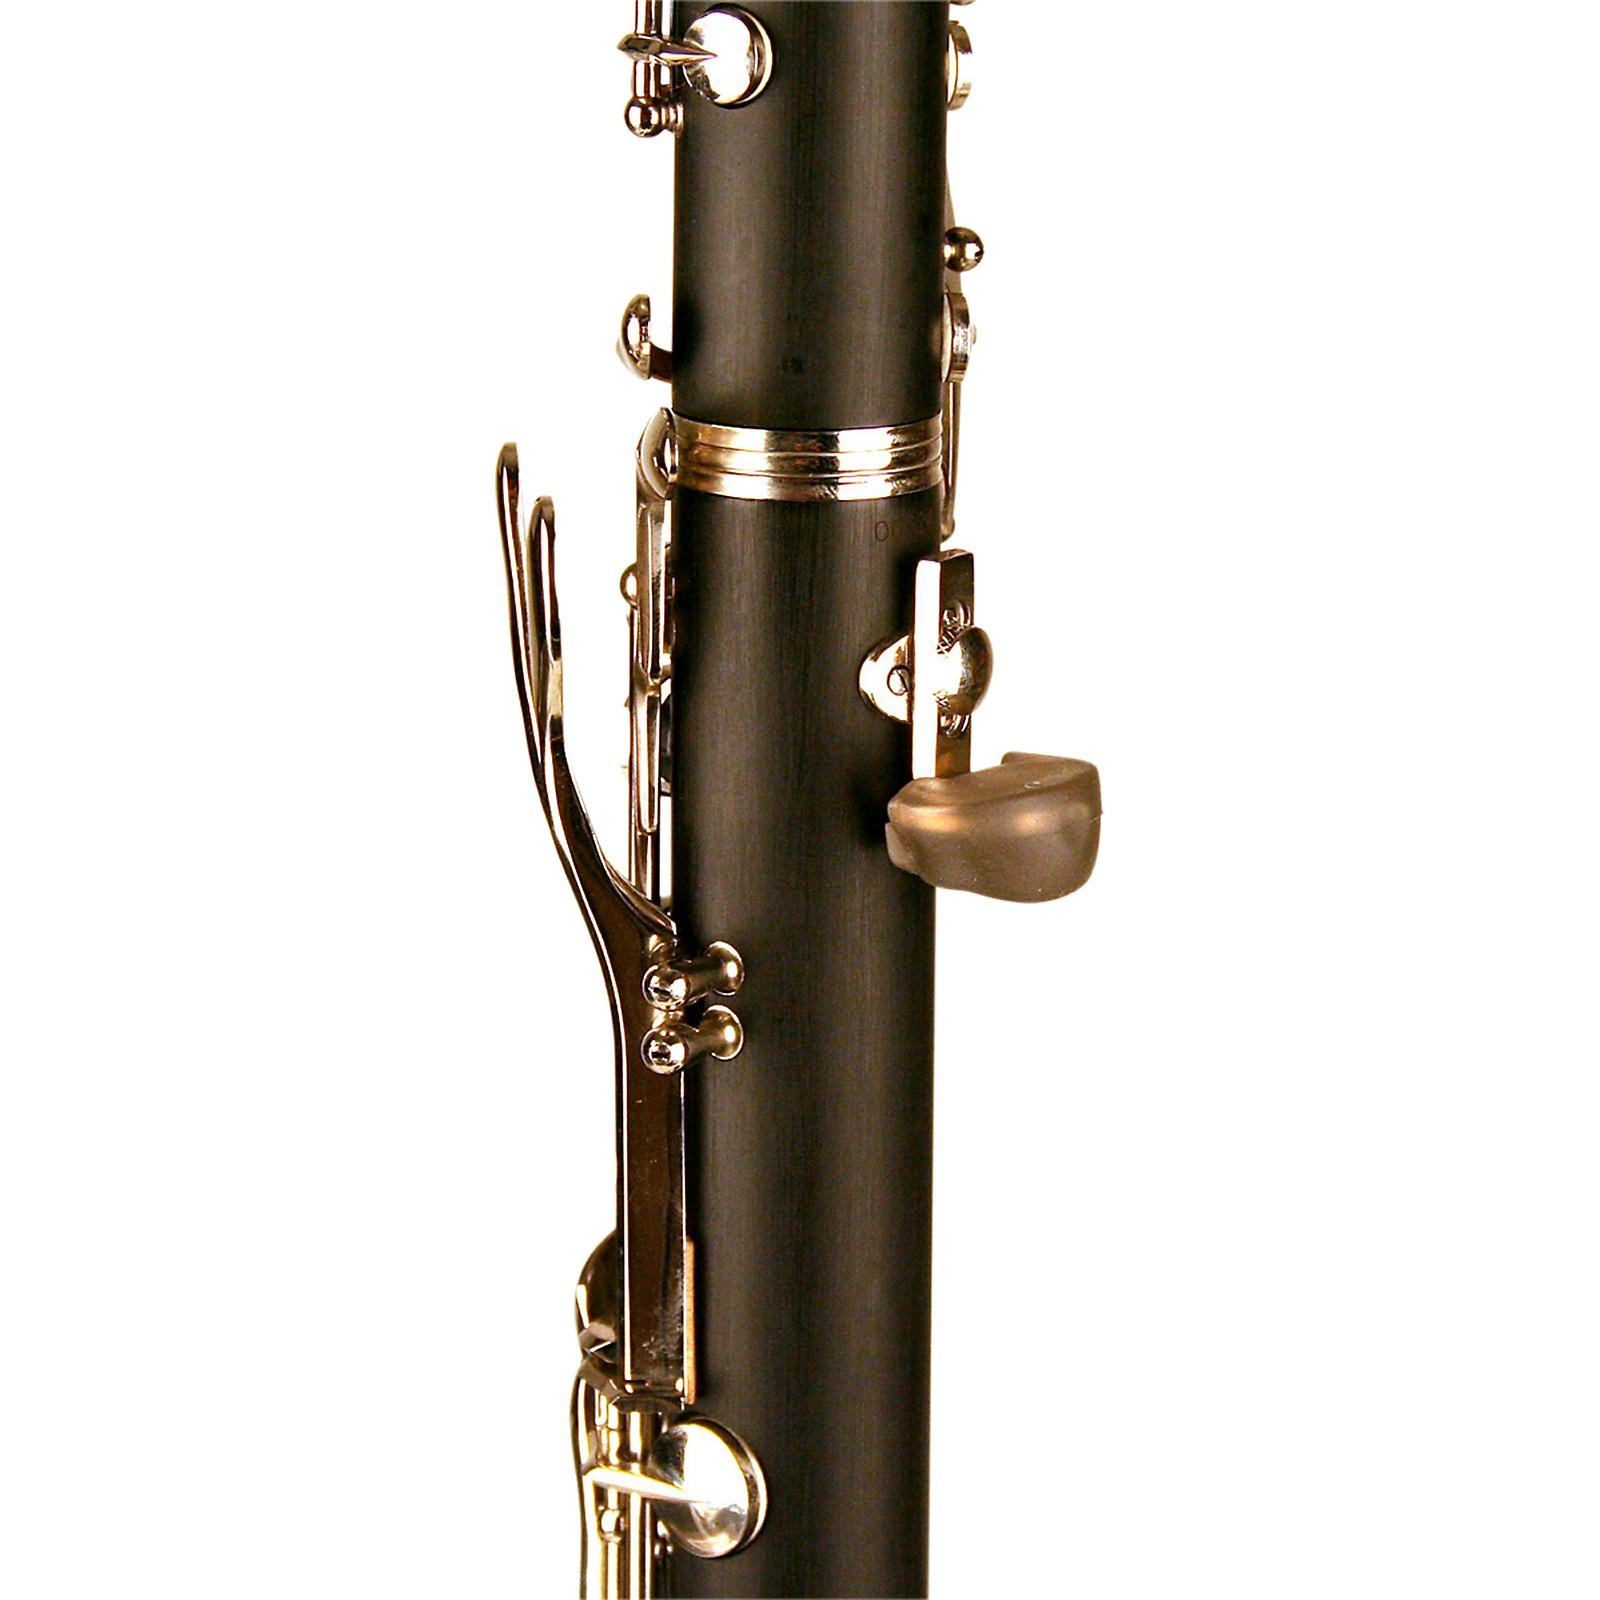 Protec Clarinet / Oboe Thumbrest Cushion